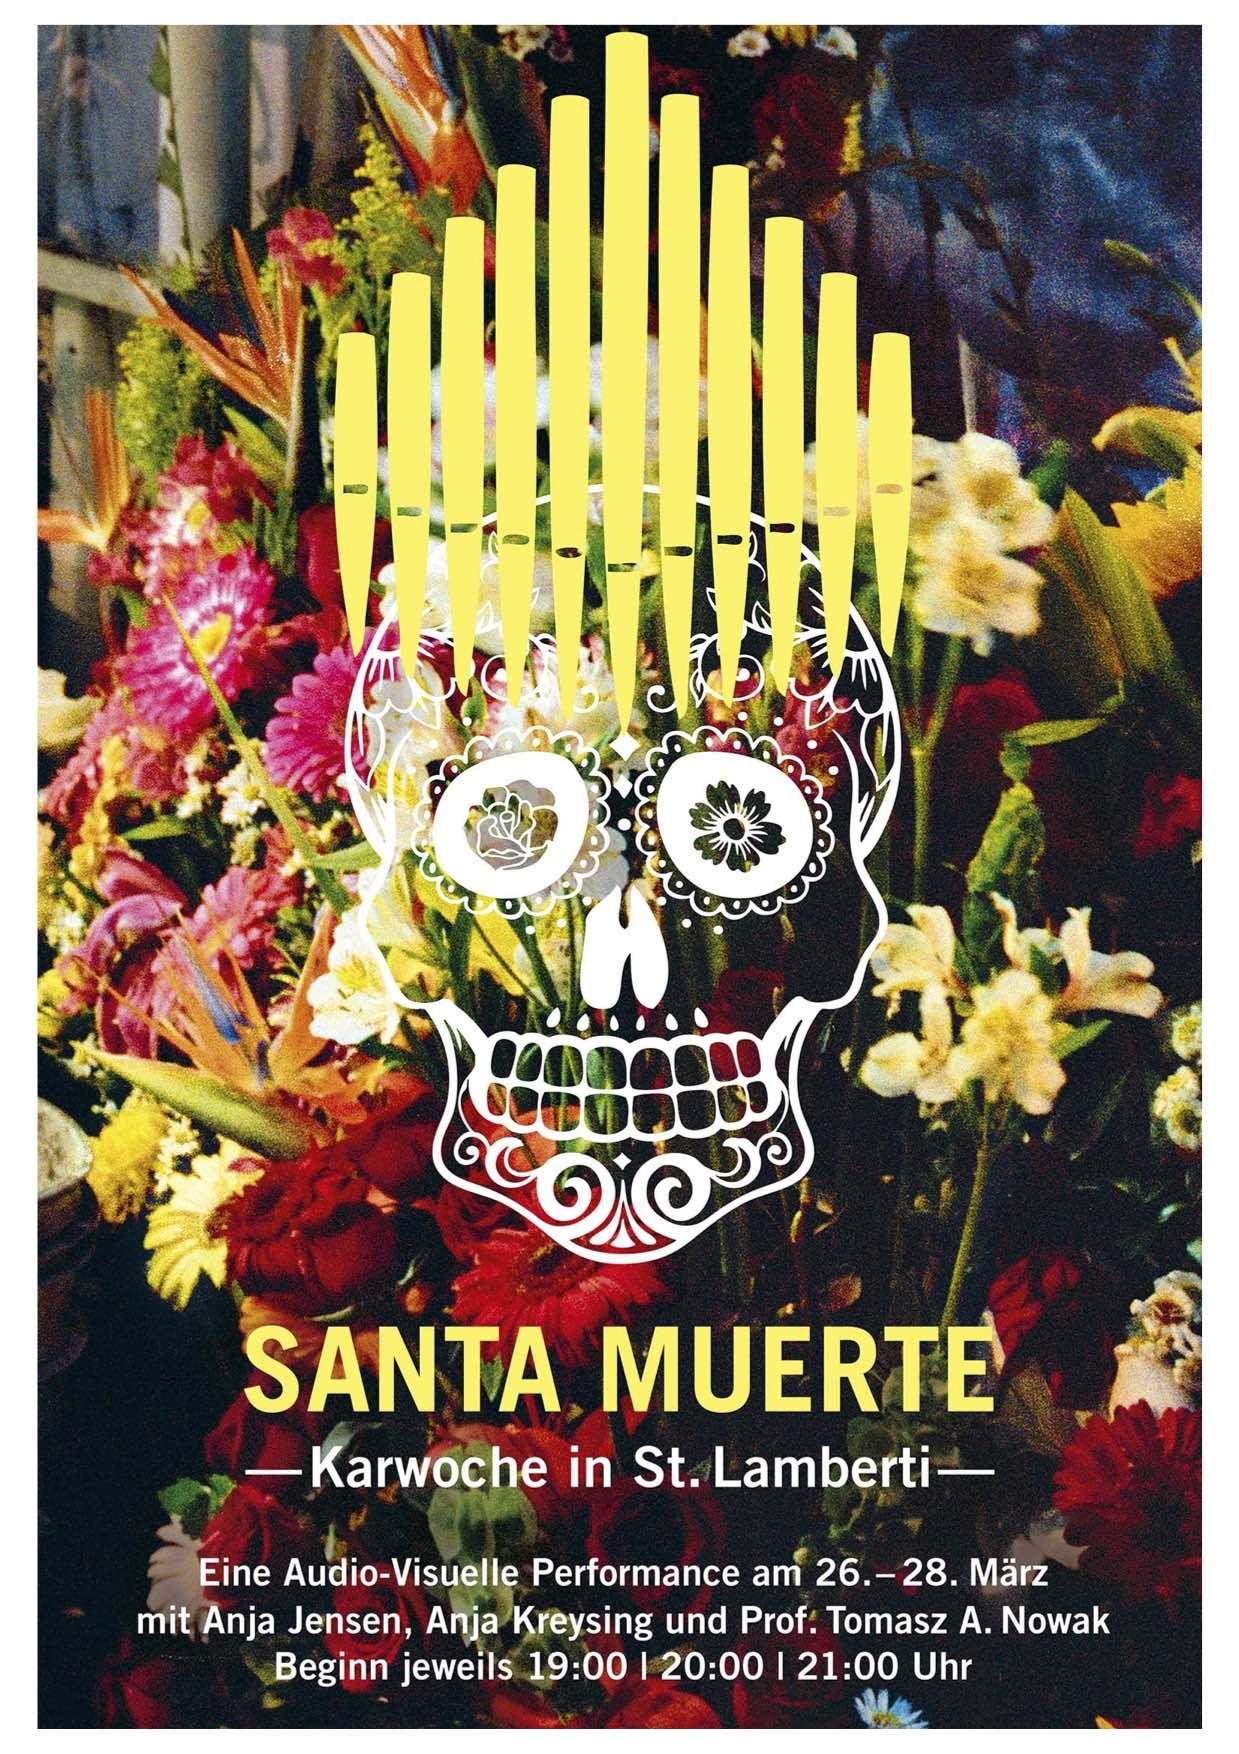 SANTA_MUERTE Plakat